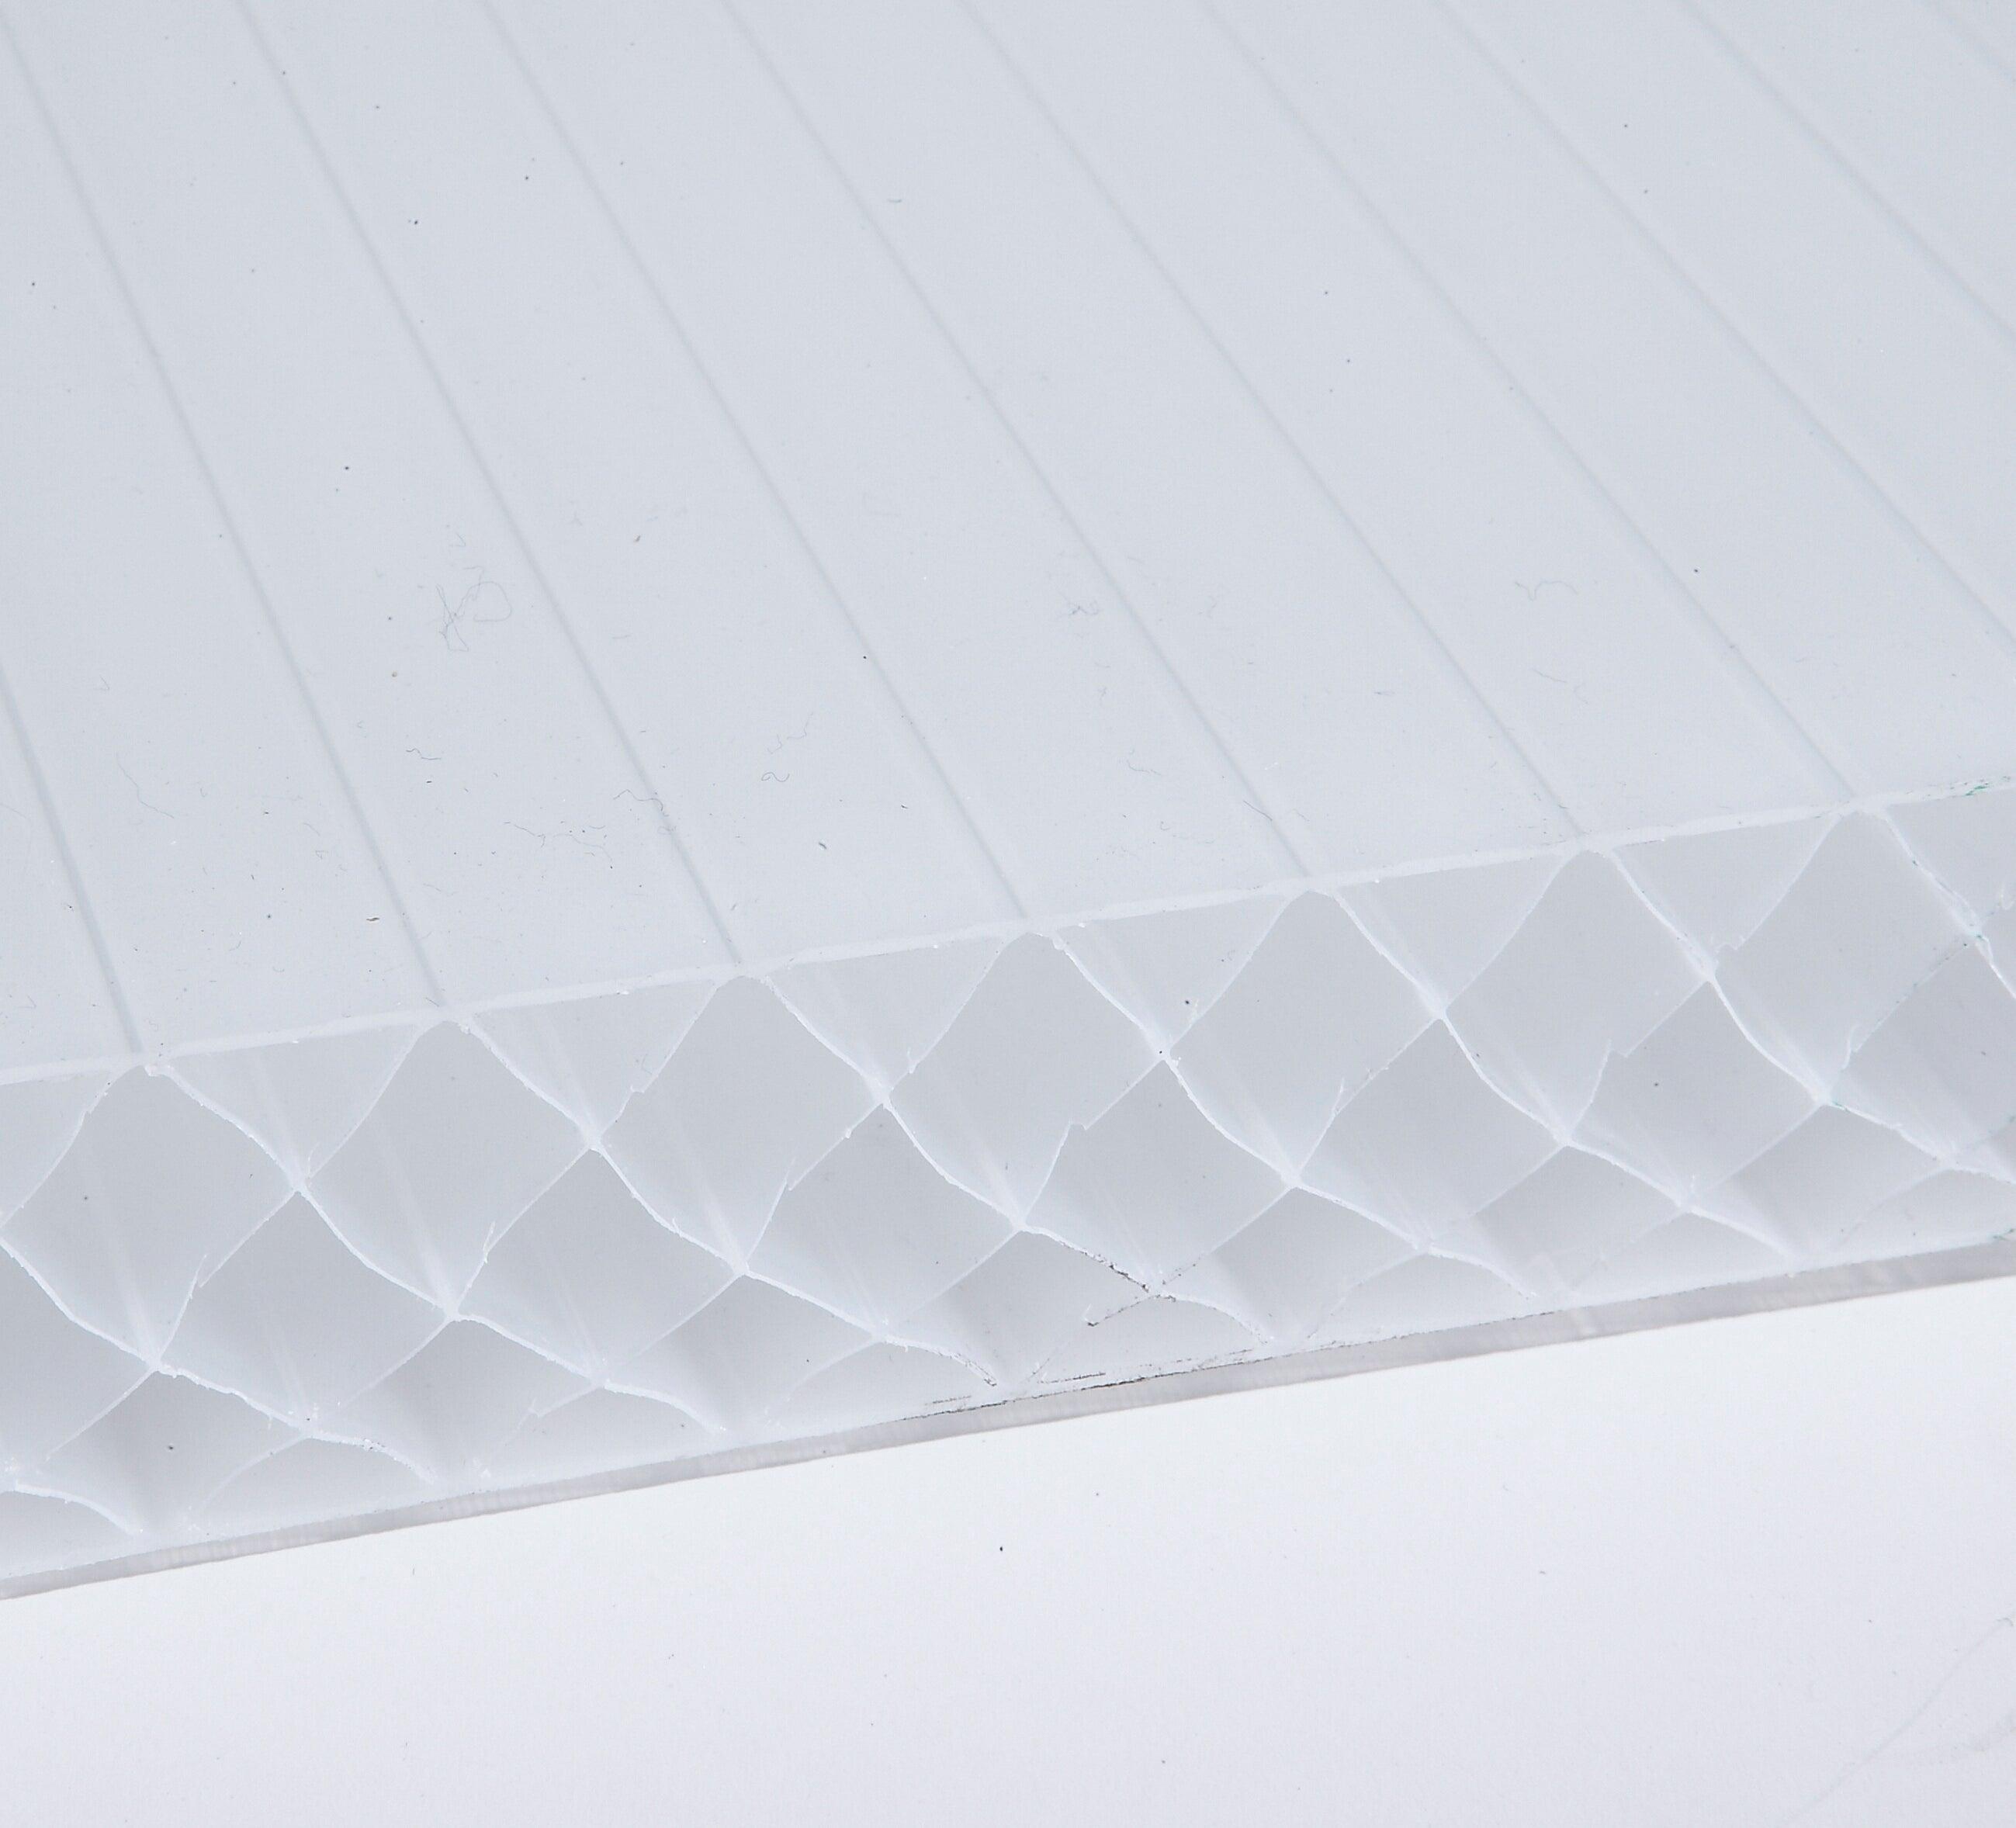 Plaque Polycarbonate Translucide Leroy Merlin